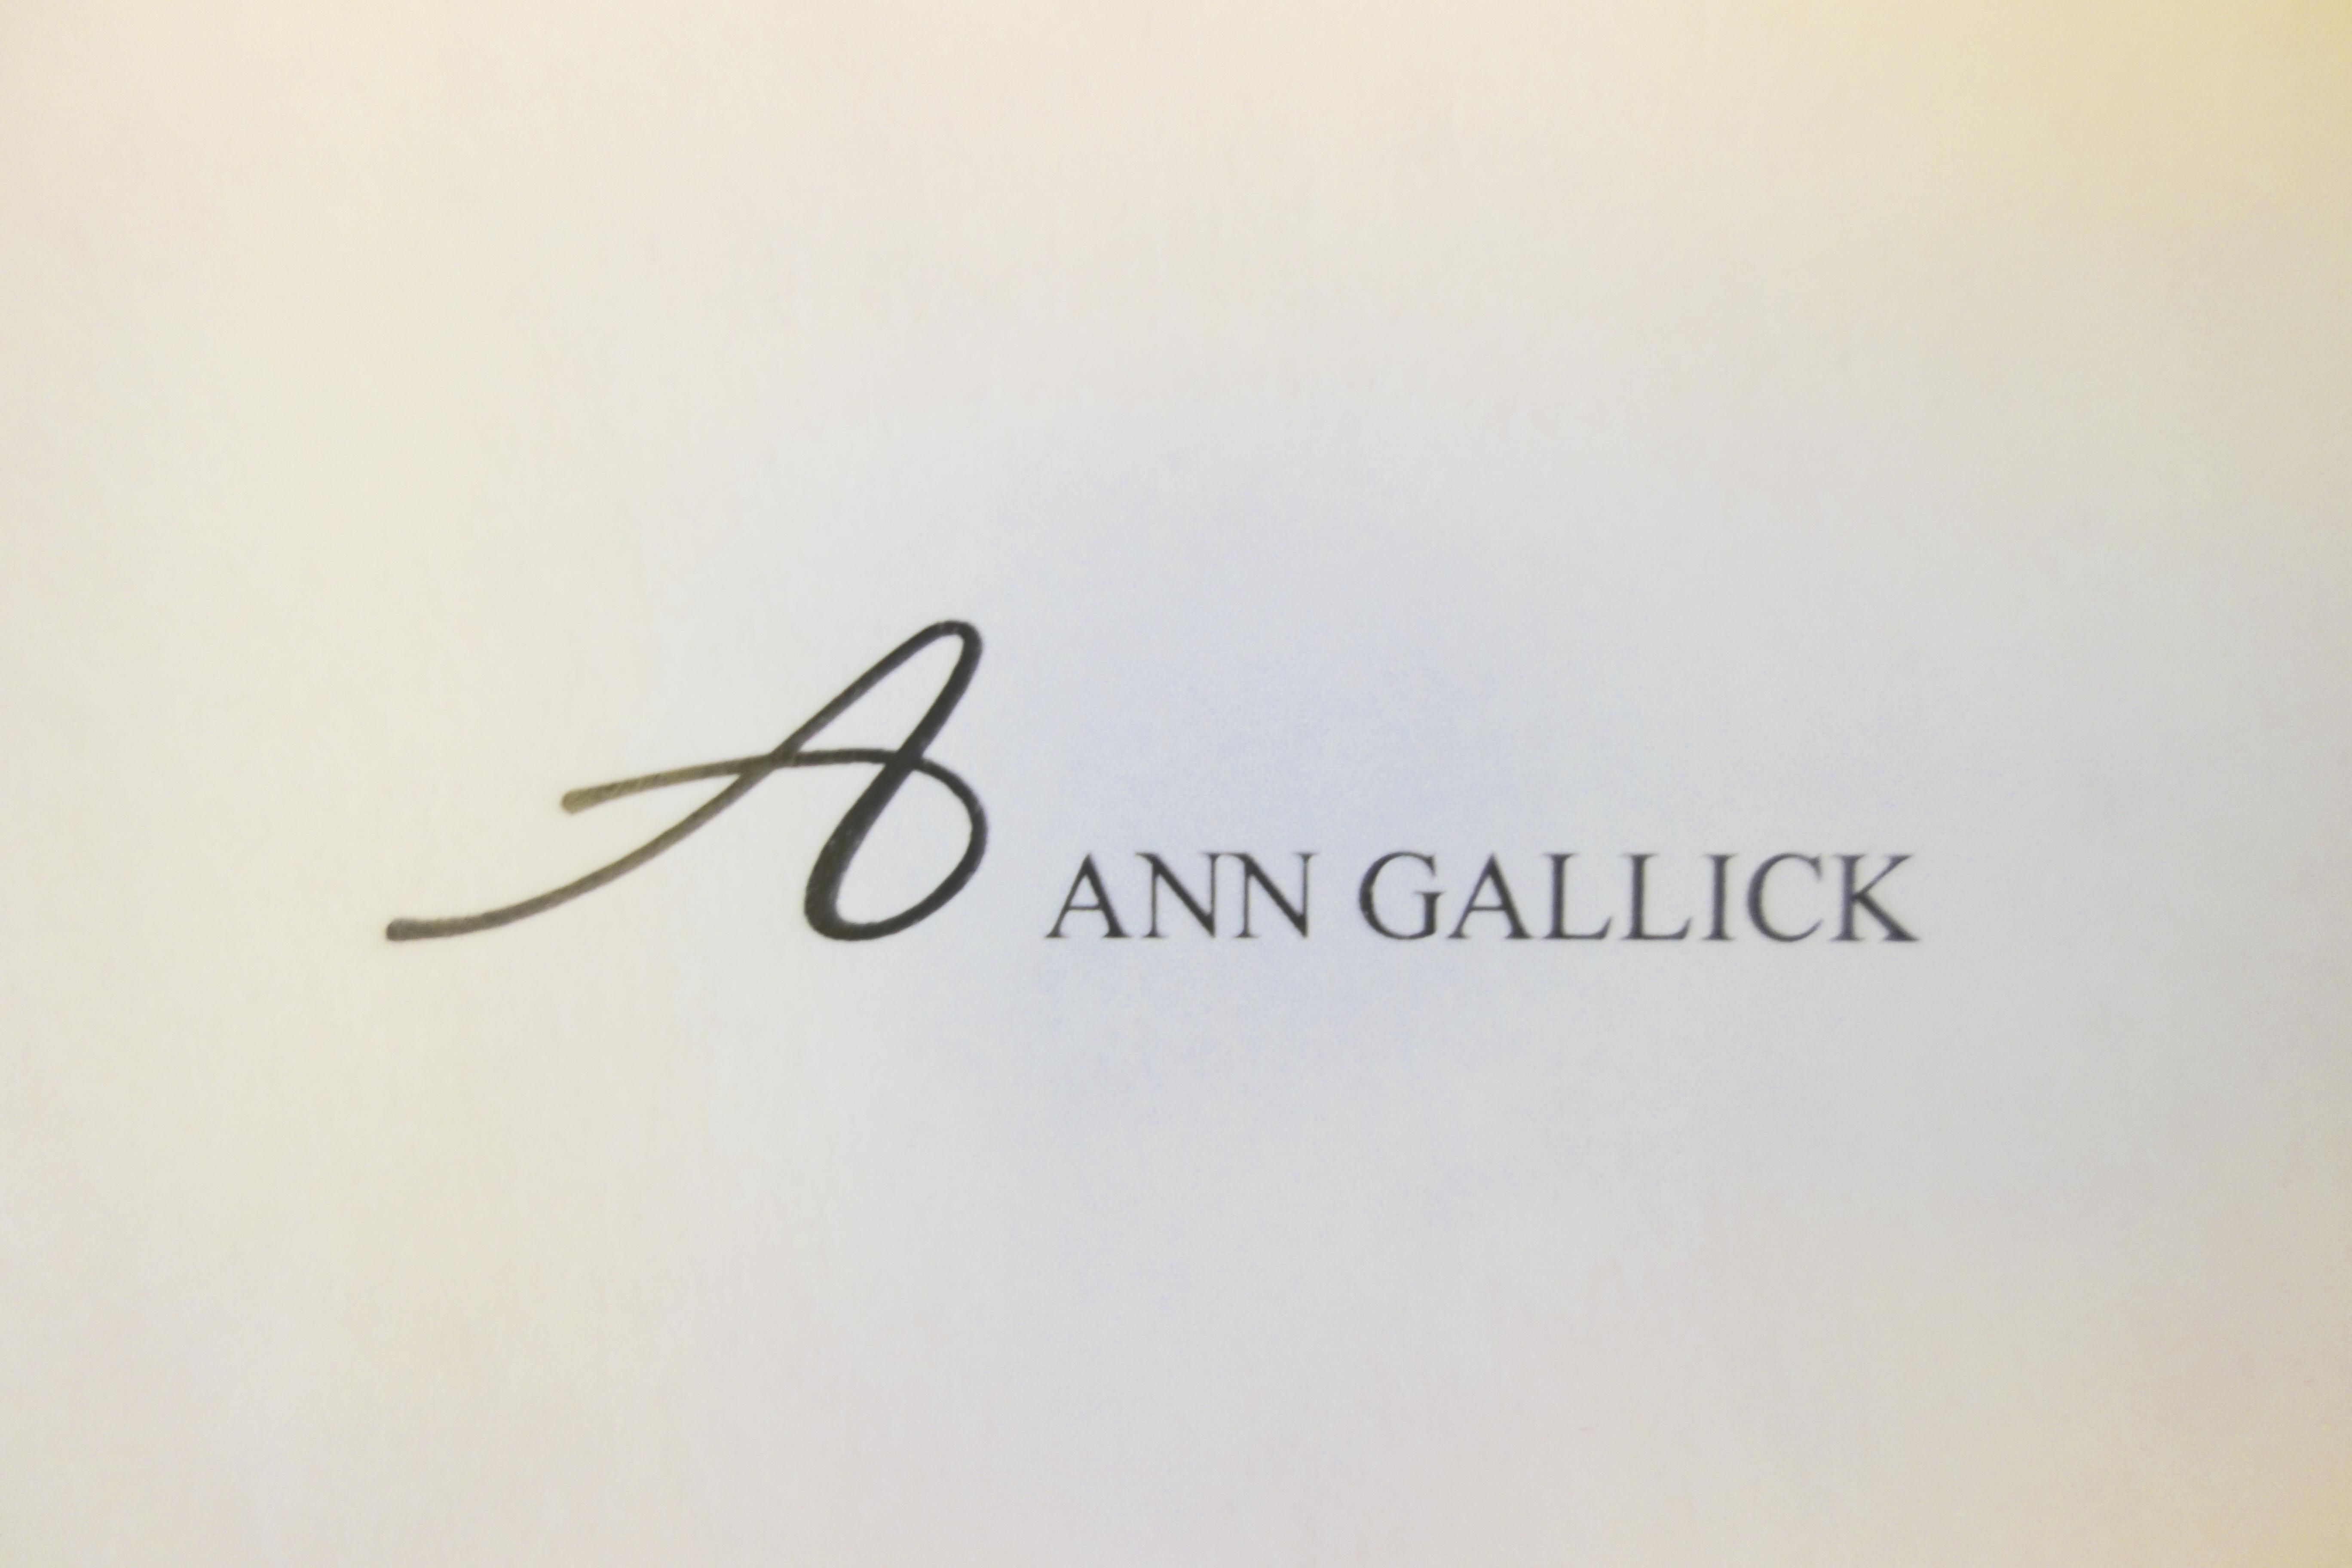 Ann Gallick Signature